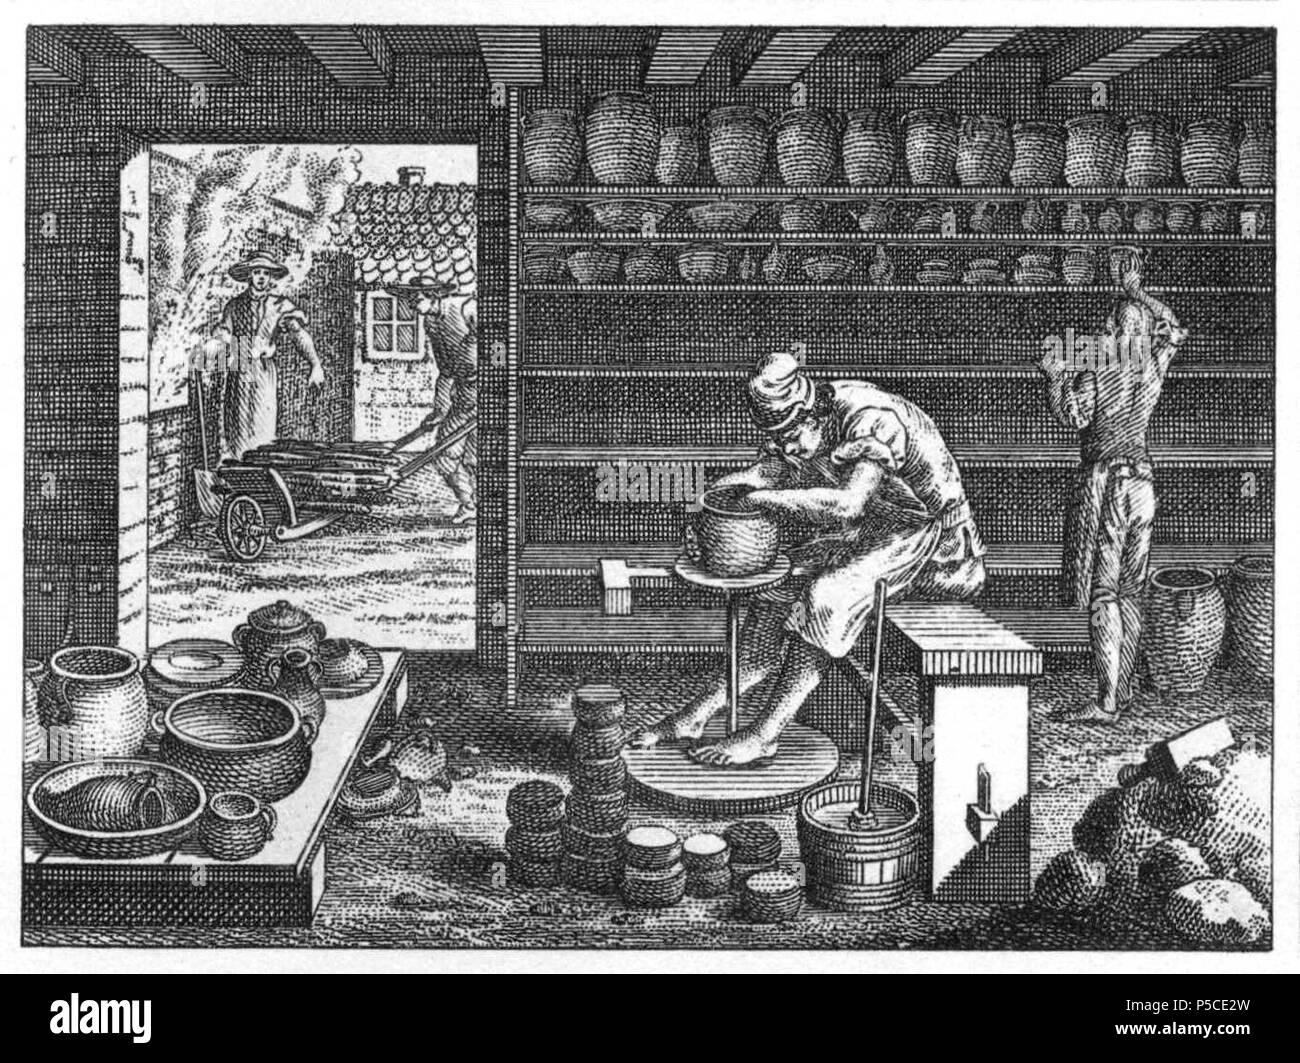 N/A. Ficha. LV. Handwerke und Künste. c) Der Töpfer auf cerquero Drehscheibe. Fertige Gefäße; Teller, Töpfe Schüsseln, usw. Der Handlanger. In der Ferne der Dachziegel Brennofen, usw. (Beschreibung lt. Quelle) . 1774. Daniel Chodowiecki (1726-1801) Nombres alternativos Daniel Nikolaus Chodowiecki Descripción pintor y grabador germano-polaco Fecha de nacimiento/muerte el 16 de octubre de 1726 7 de febrero de 1801 Lugar de nacimiento/muerte Gdask ubicación de trabajo de Berlín Berlín : control de autoridad Q696720 ISNI VIAF:59092320:0000 0001 2134 8231 ULAN:500014861 LCCN:n50038187 NLA:36058735 340 Chodowiecki WorldCat Ba Foto de stock